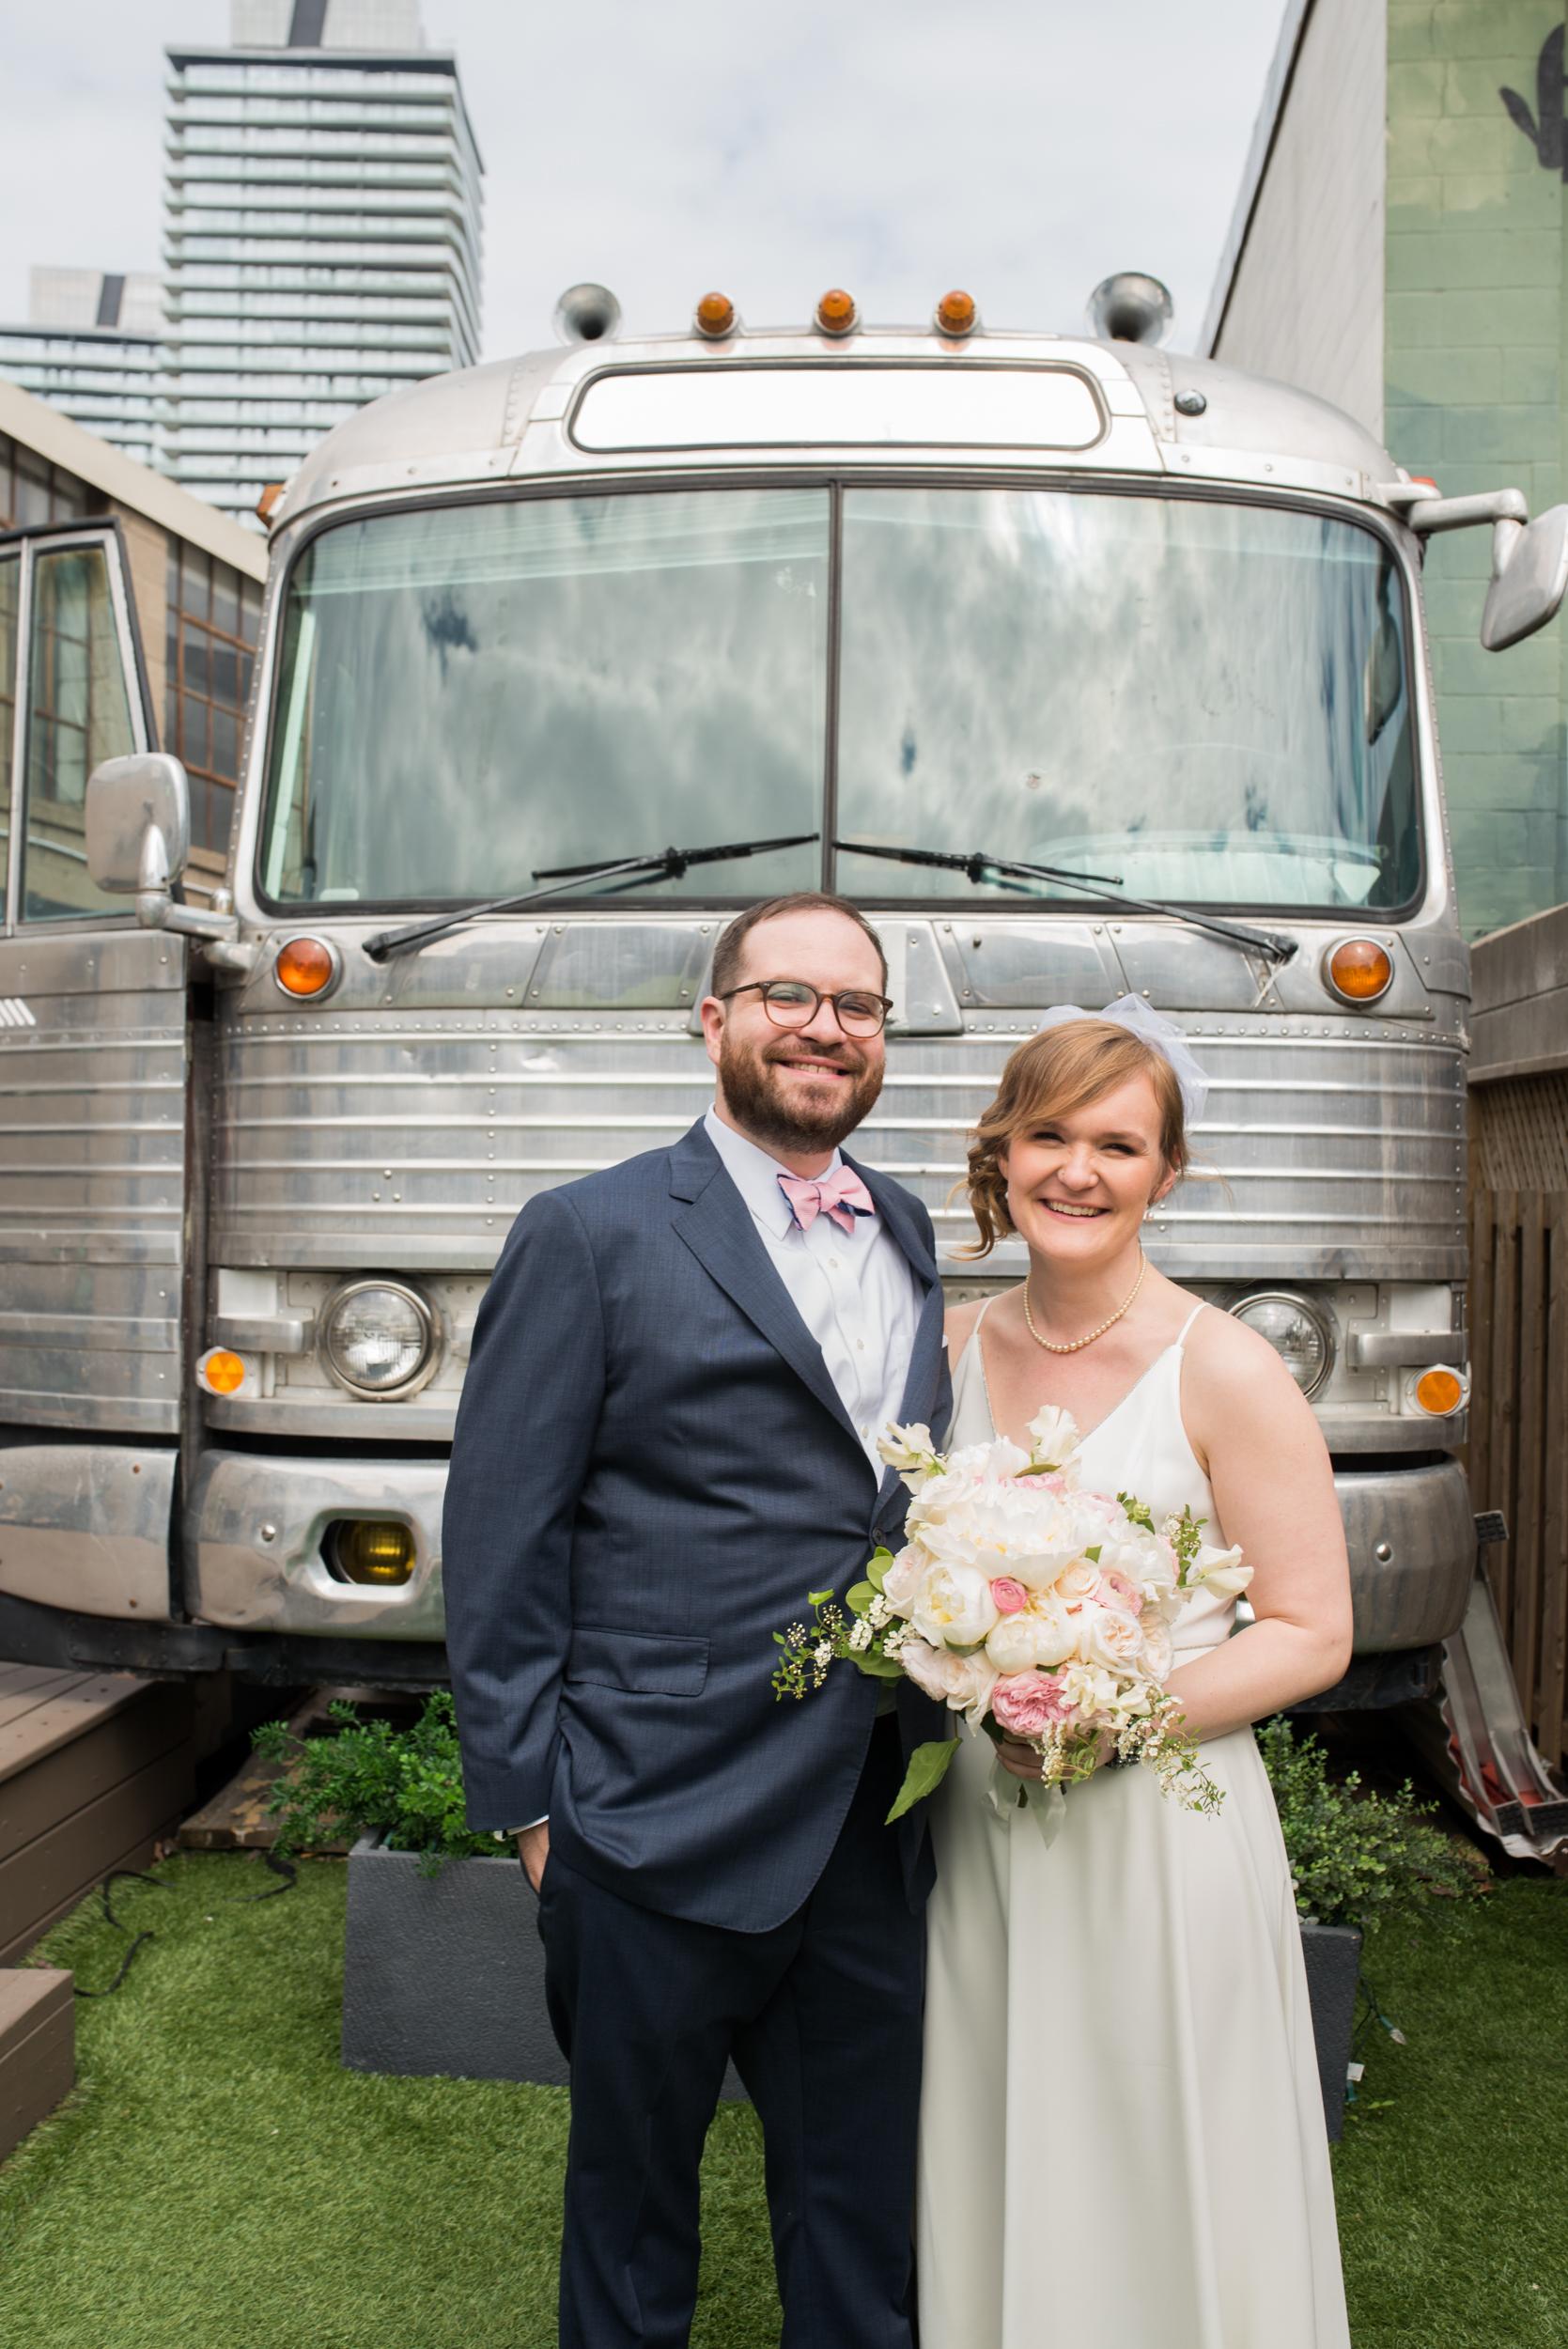 Toronto Wedding at Airship 37 with Soundslikeyellowphotography